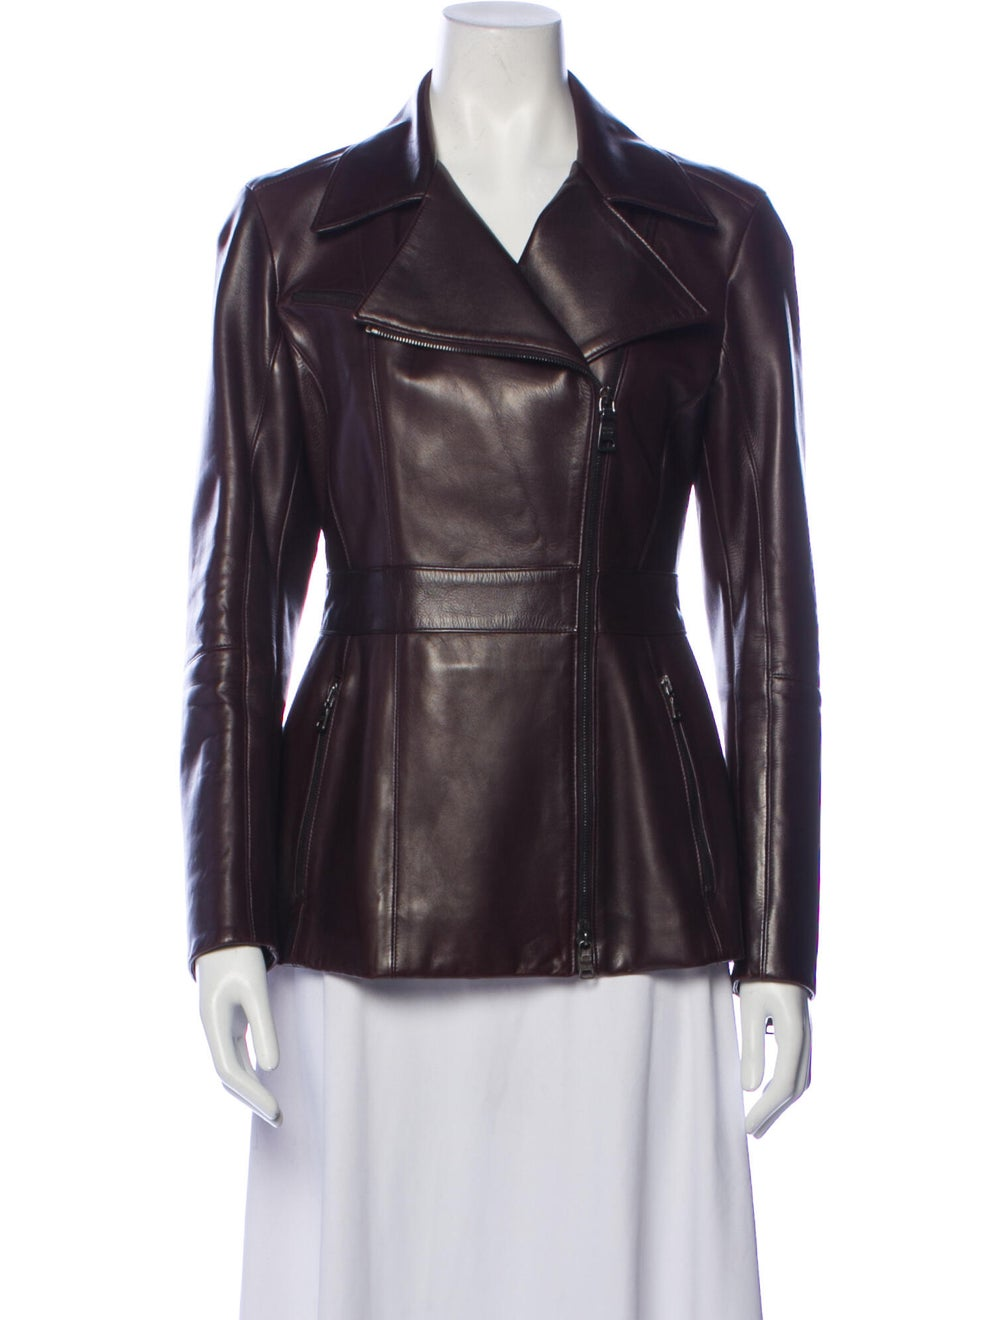 Prada Leather Biker Jacket Brown - image 1